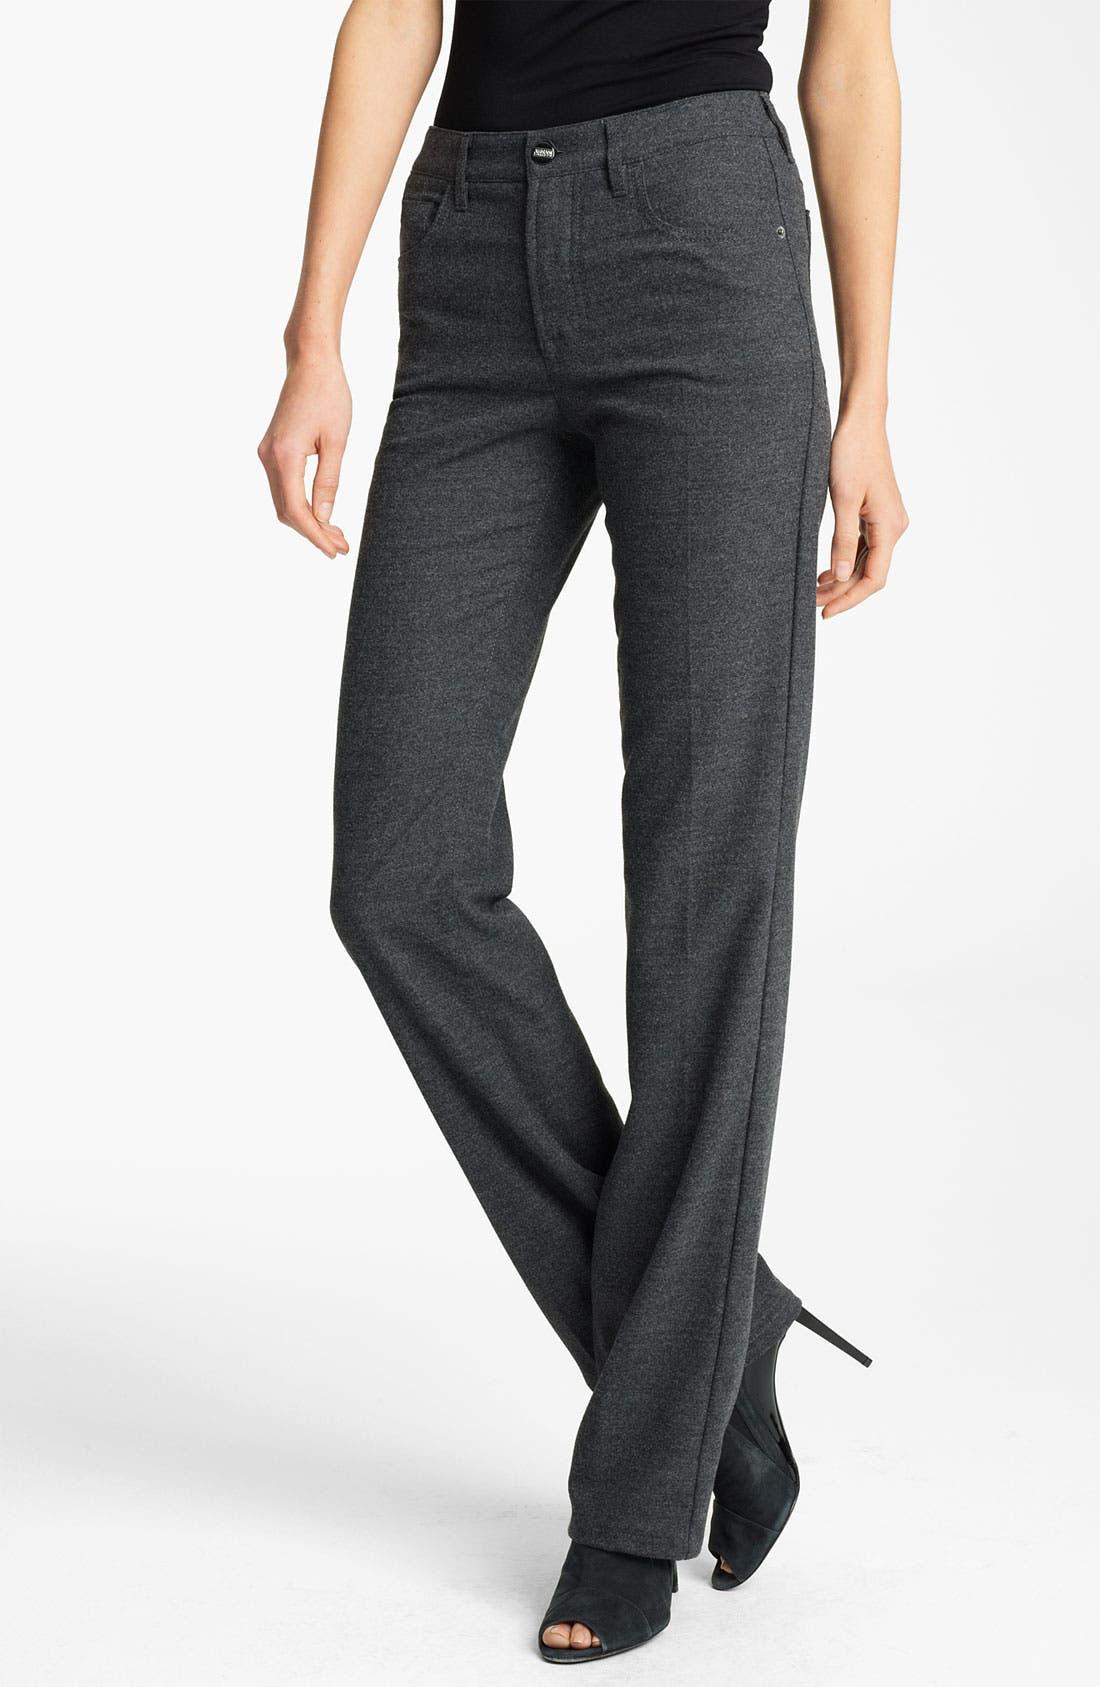 Alternate Image 1 Selected - Armani Collezioni 5-Pocket Stretch Wool Pants